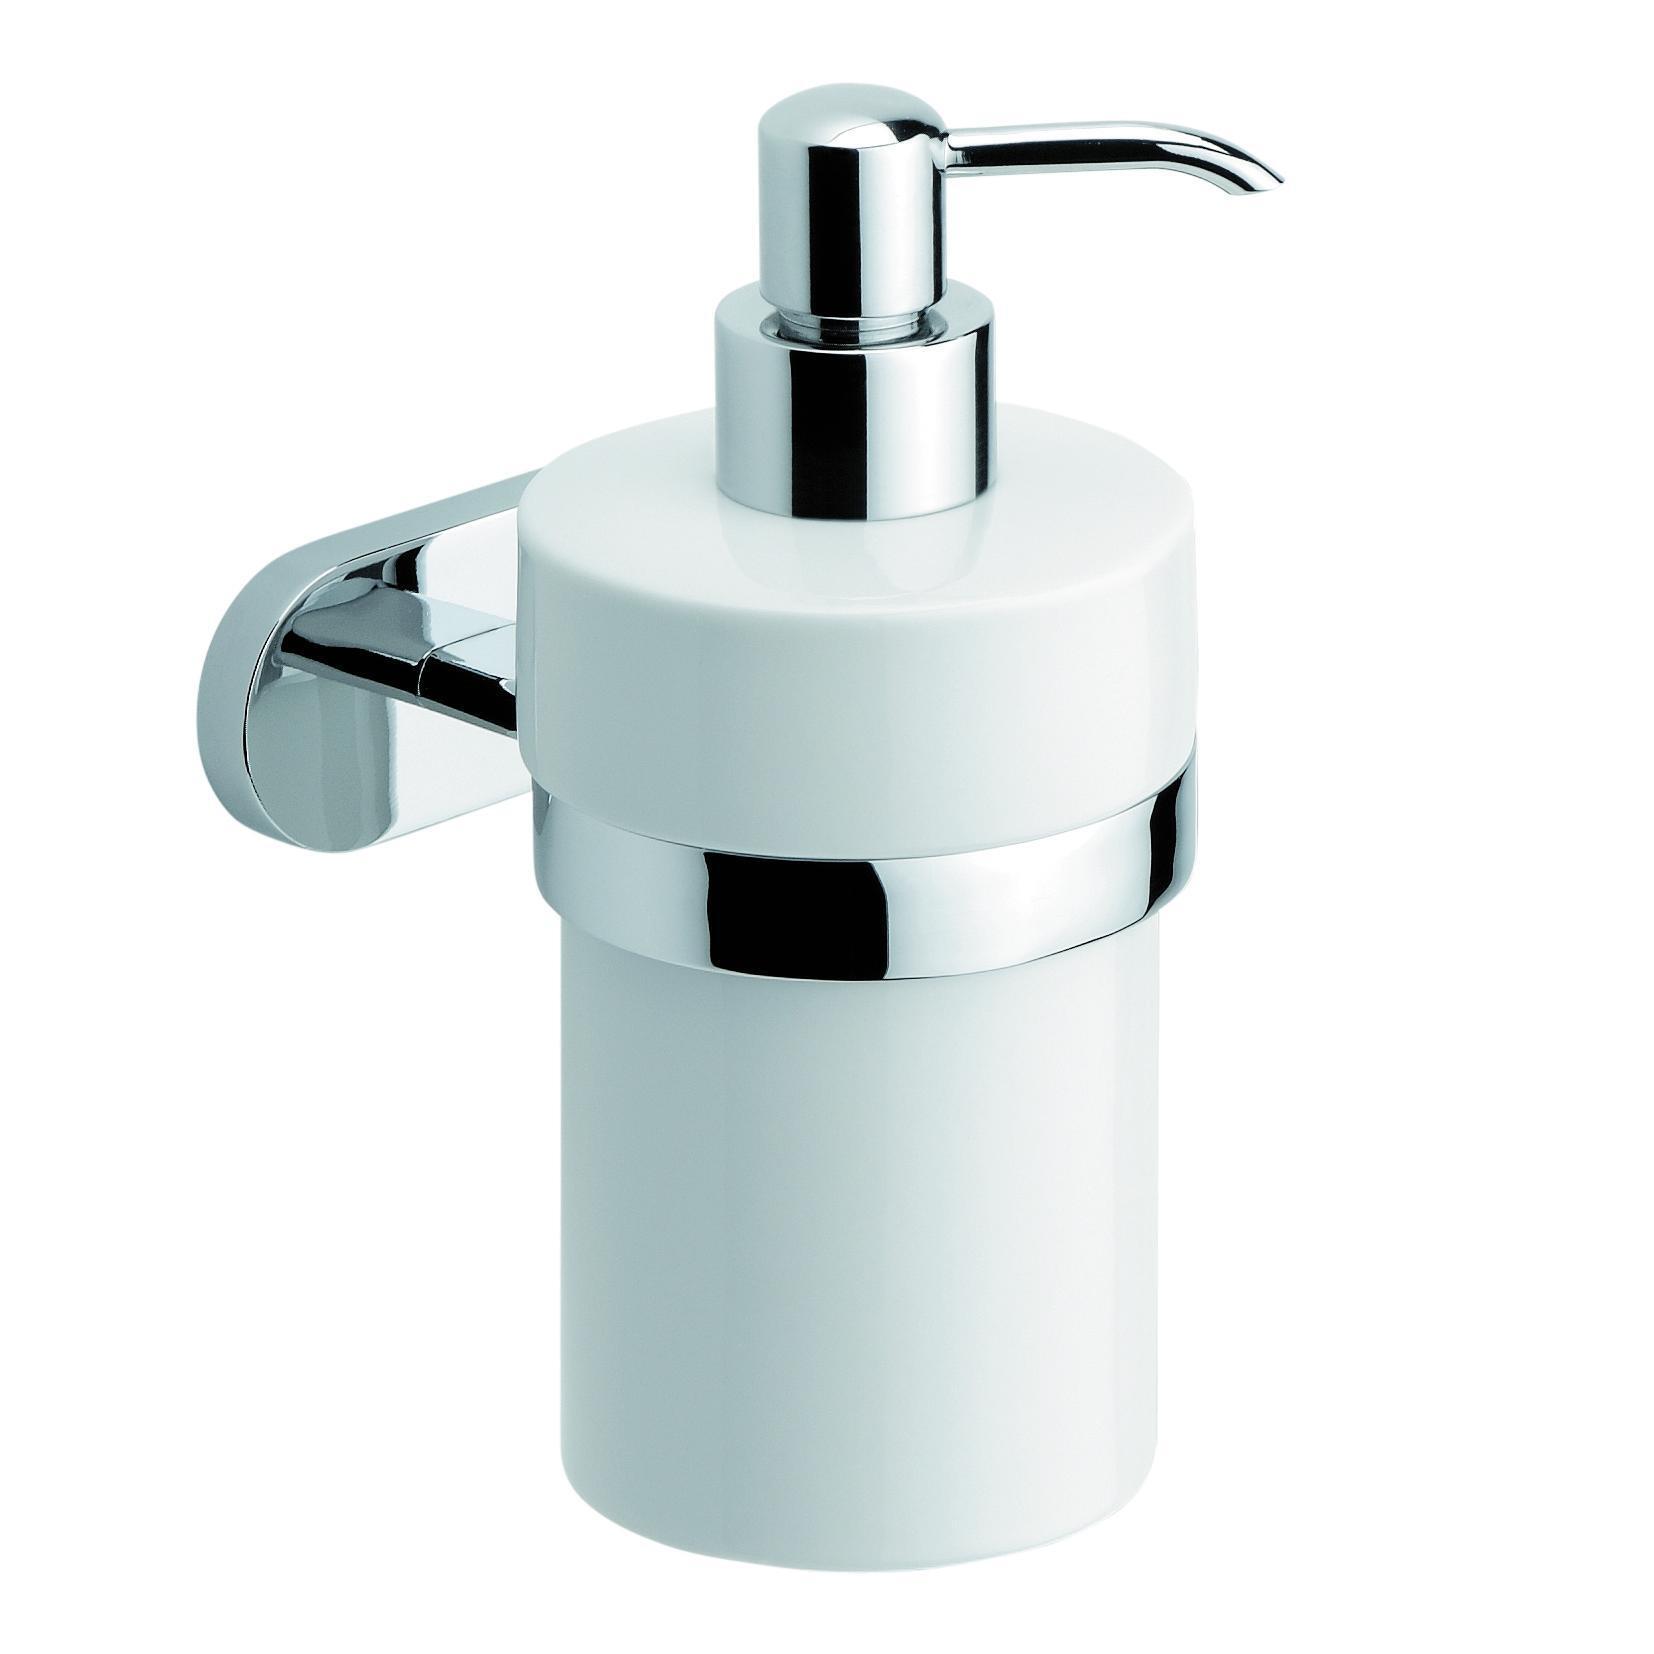 Dispenser sapone Louise bianco